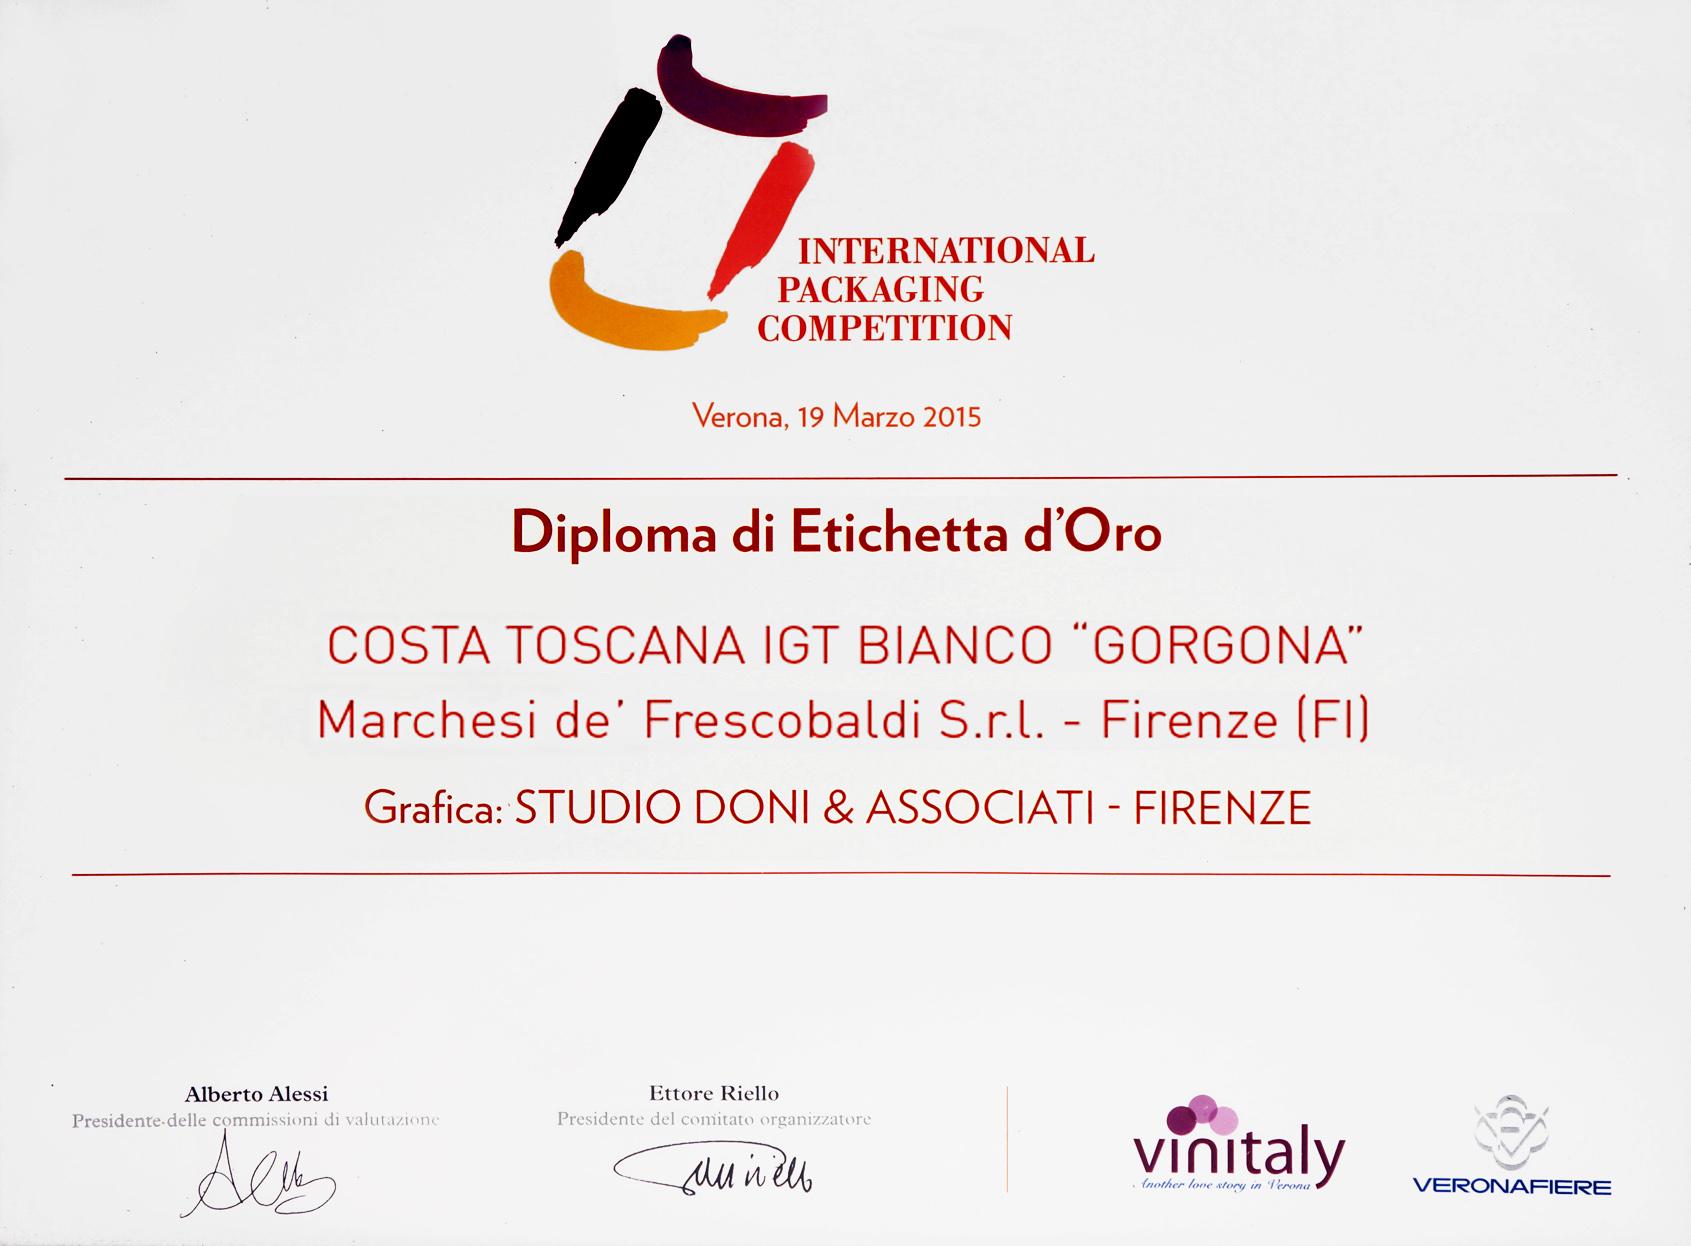 doni-etichetta-oro-gorgona-frescobaldi-vinitaly-2015